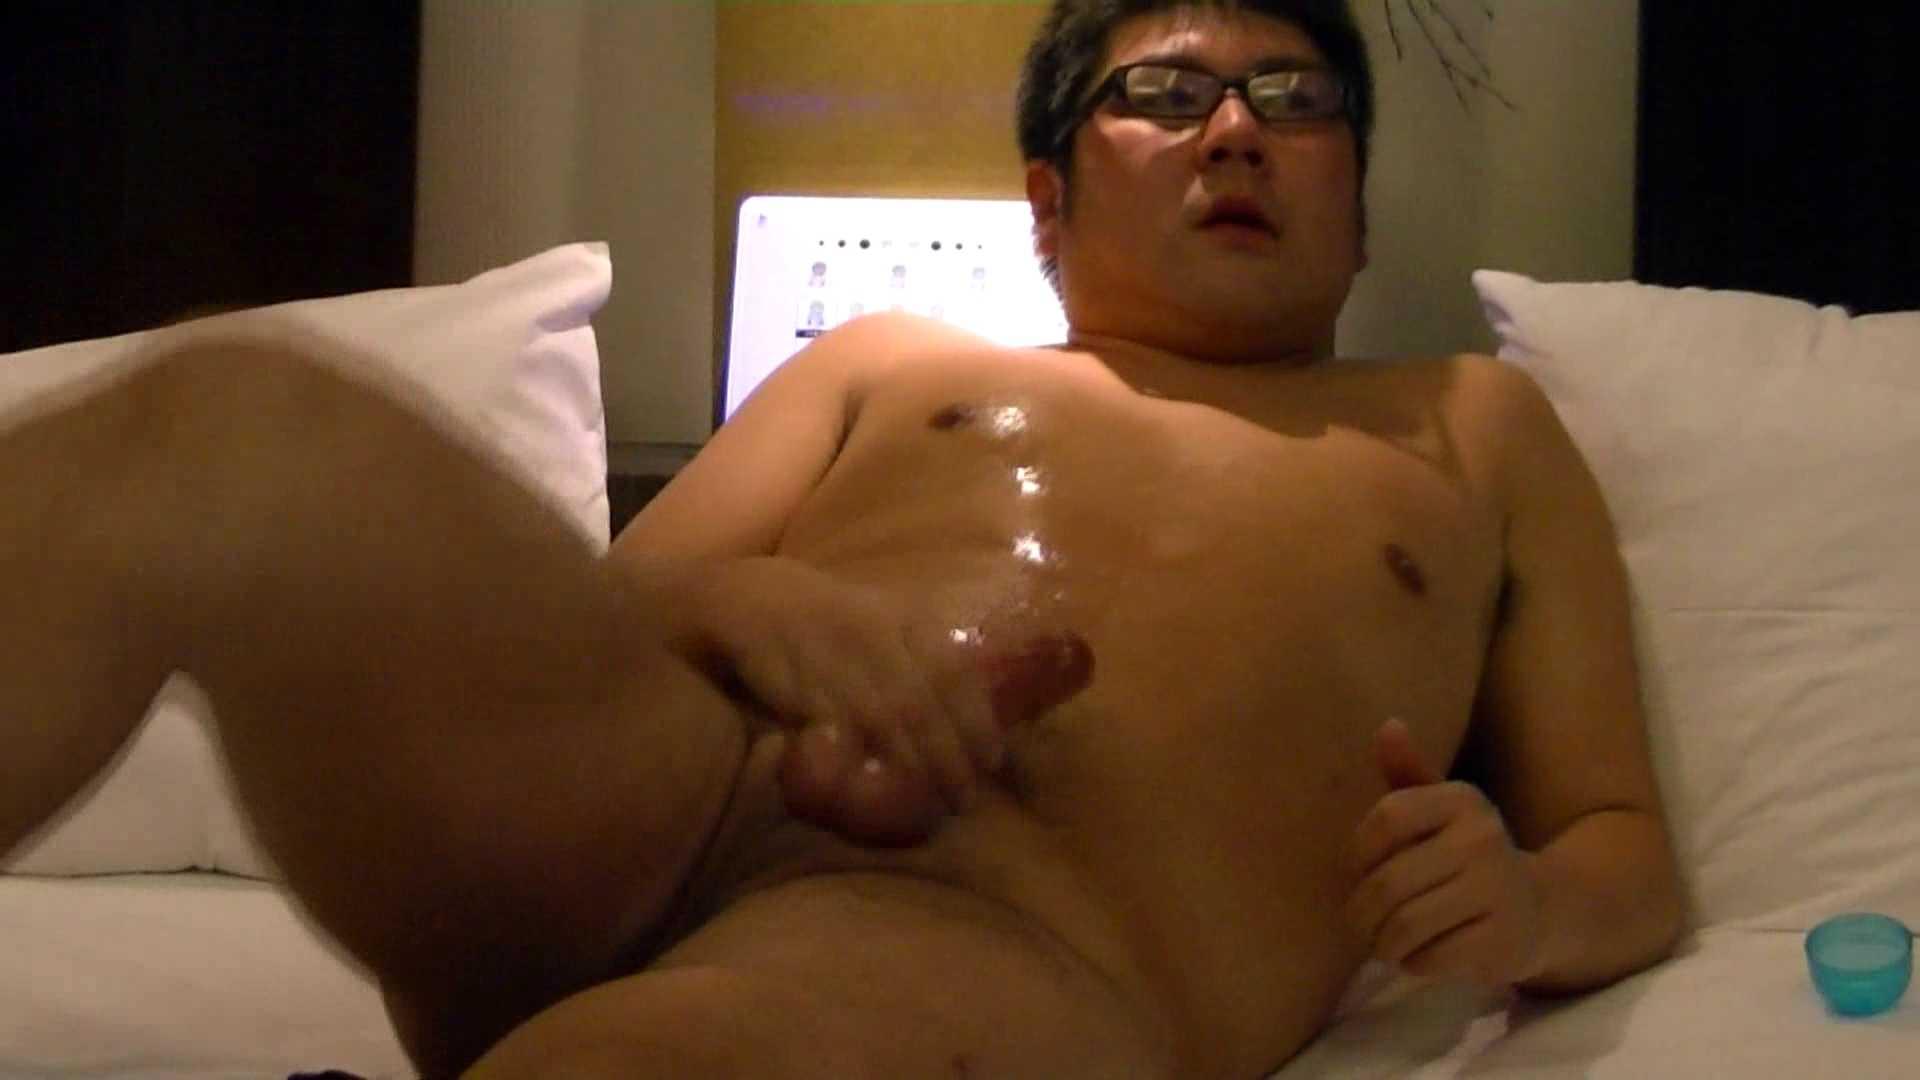 Mr.オナックスさん投稿!HD 貴方のオナニー三万円で撮影させてください。VOL.03 後編 投稿 ゲイ無修正ビデオ画像 106枚 57